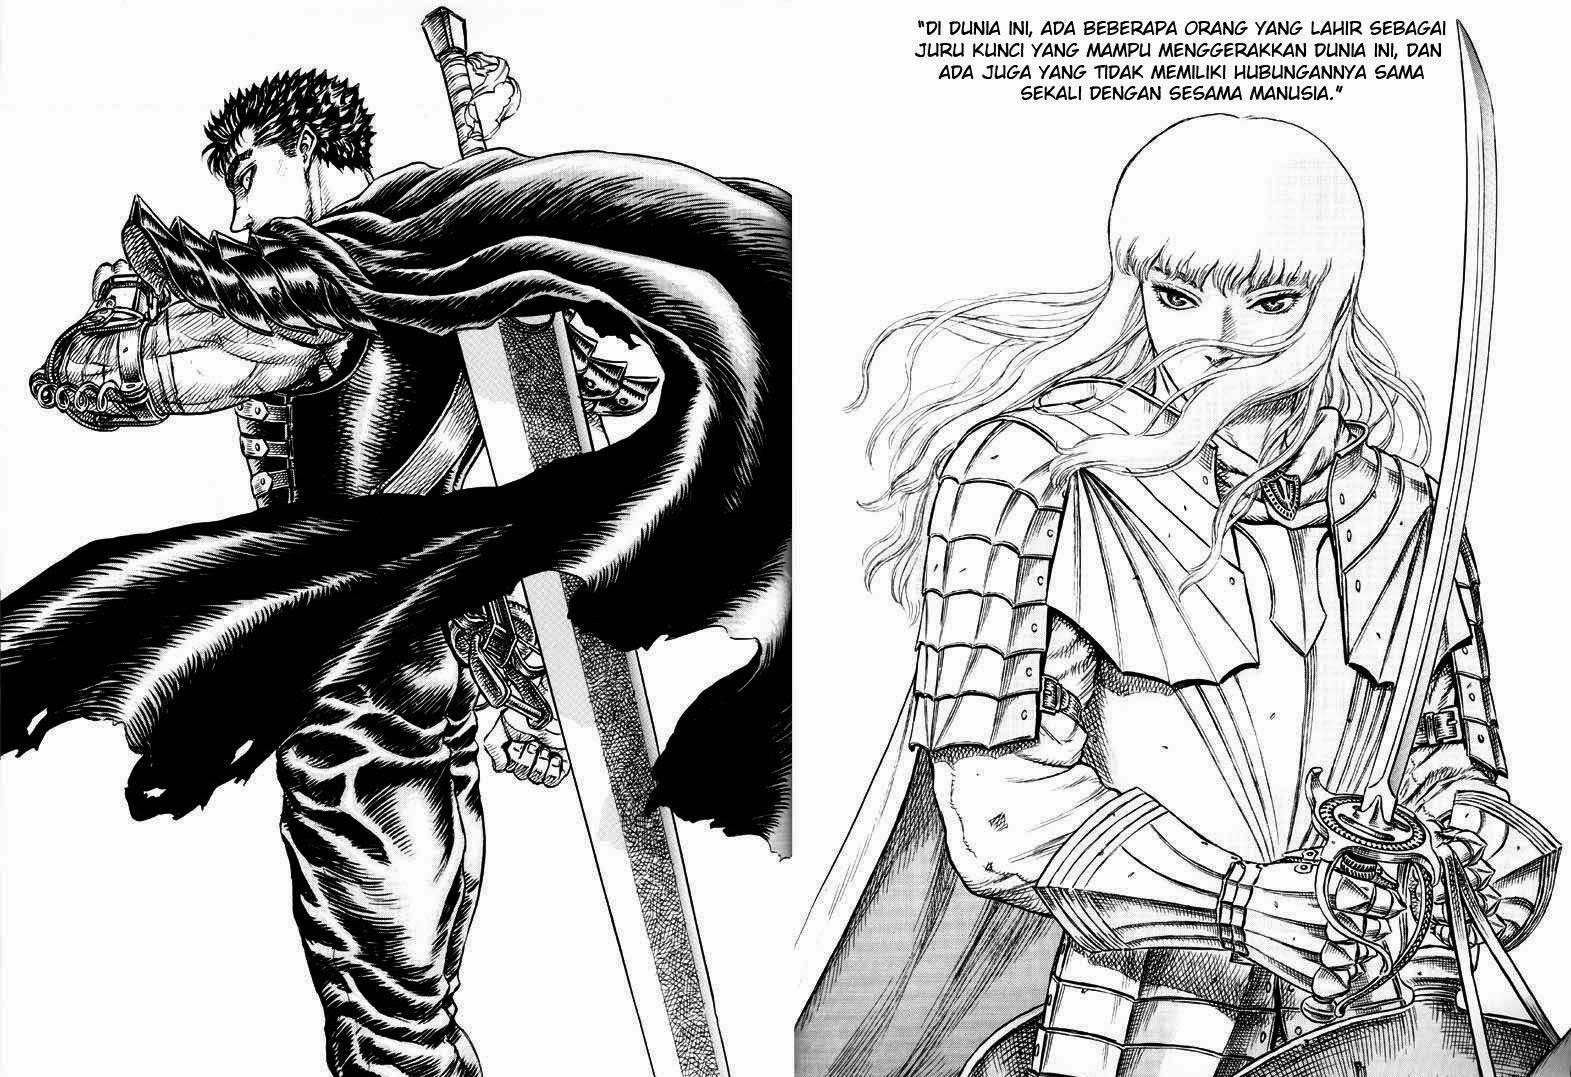 Komik berserk 096 - badai kematian 1 97 Indonesia berserk 096 - badai kematian 1 Terbaru 1|Baca Manga Komik Indonesia